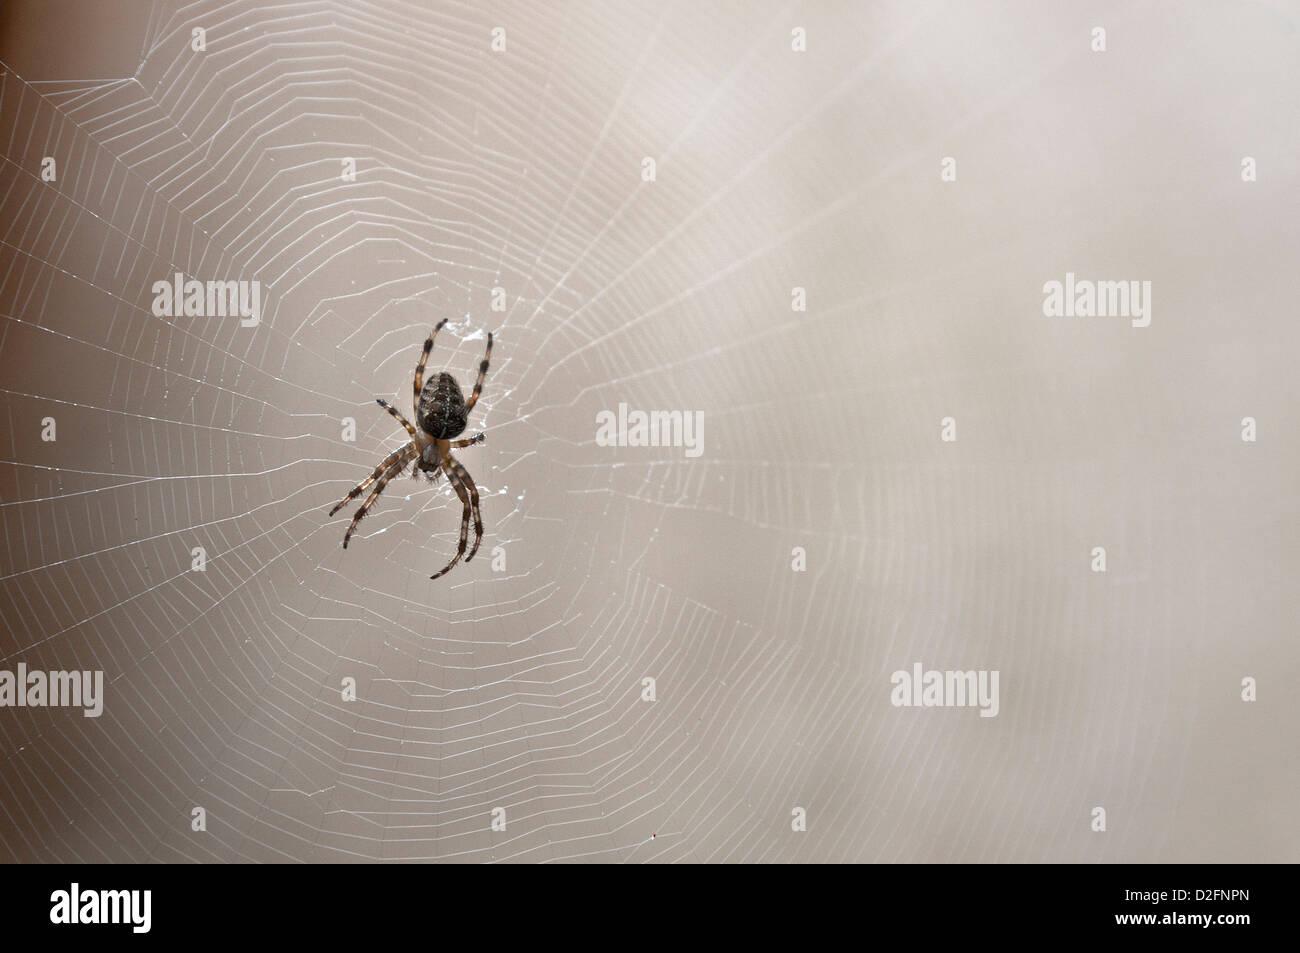 Jardin commun araignée sur sa toile d'araignée, UK Photo Stock